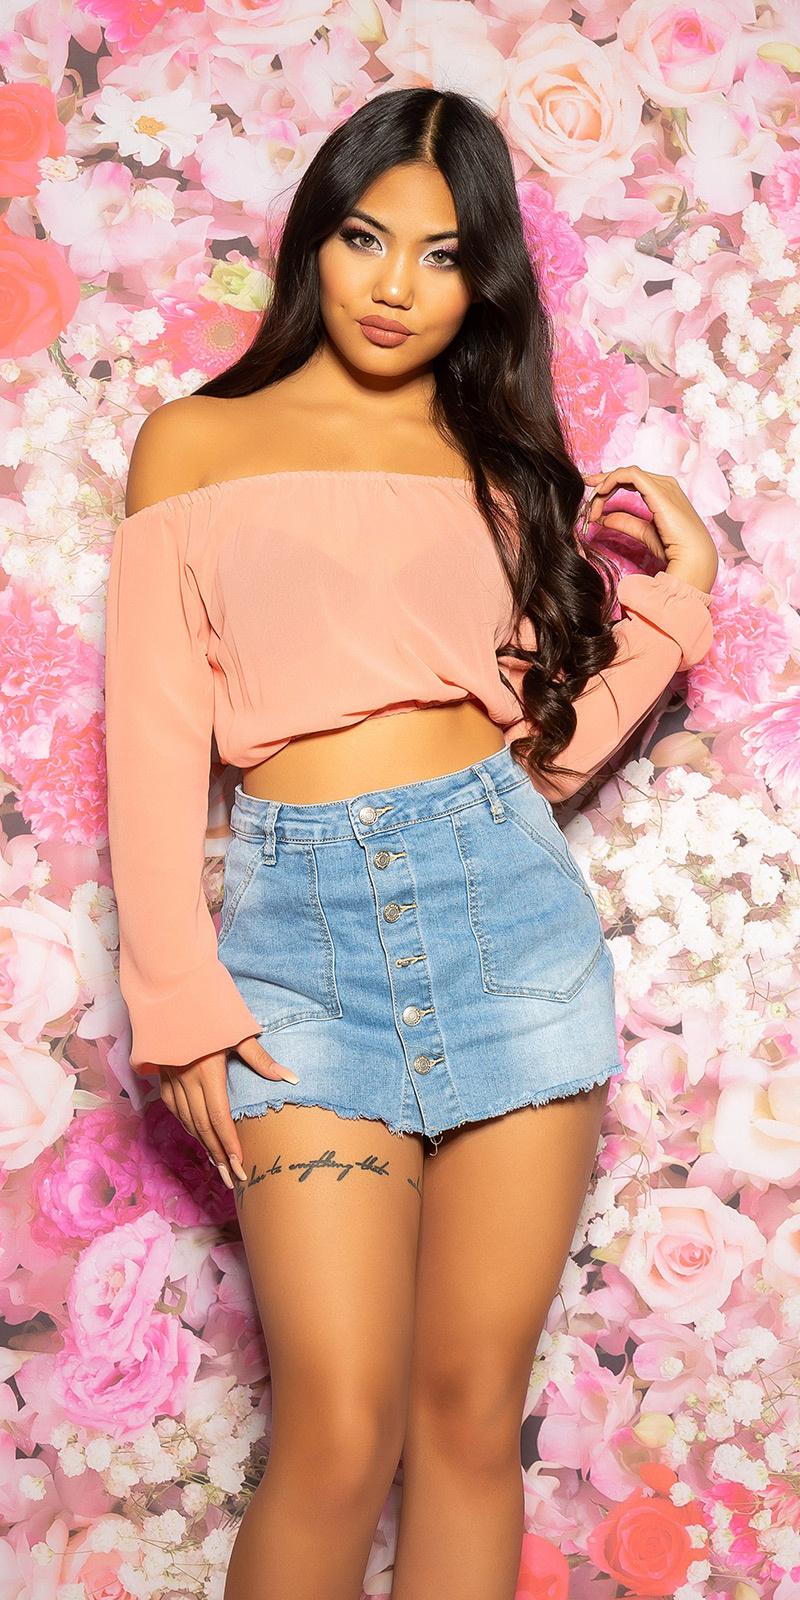 Sexy chiffon latina-crop top buikvrij abrikoos-kleurig